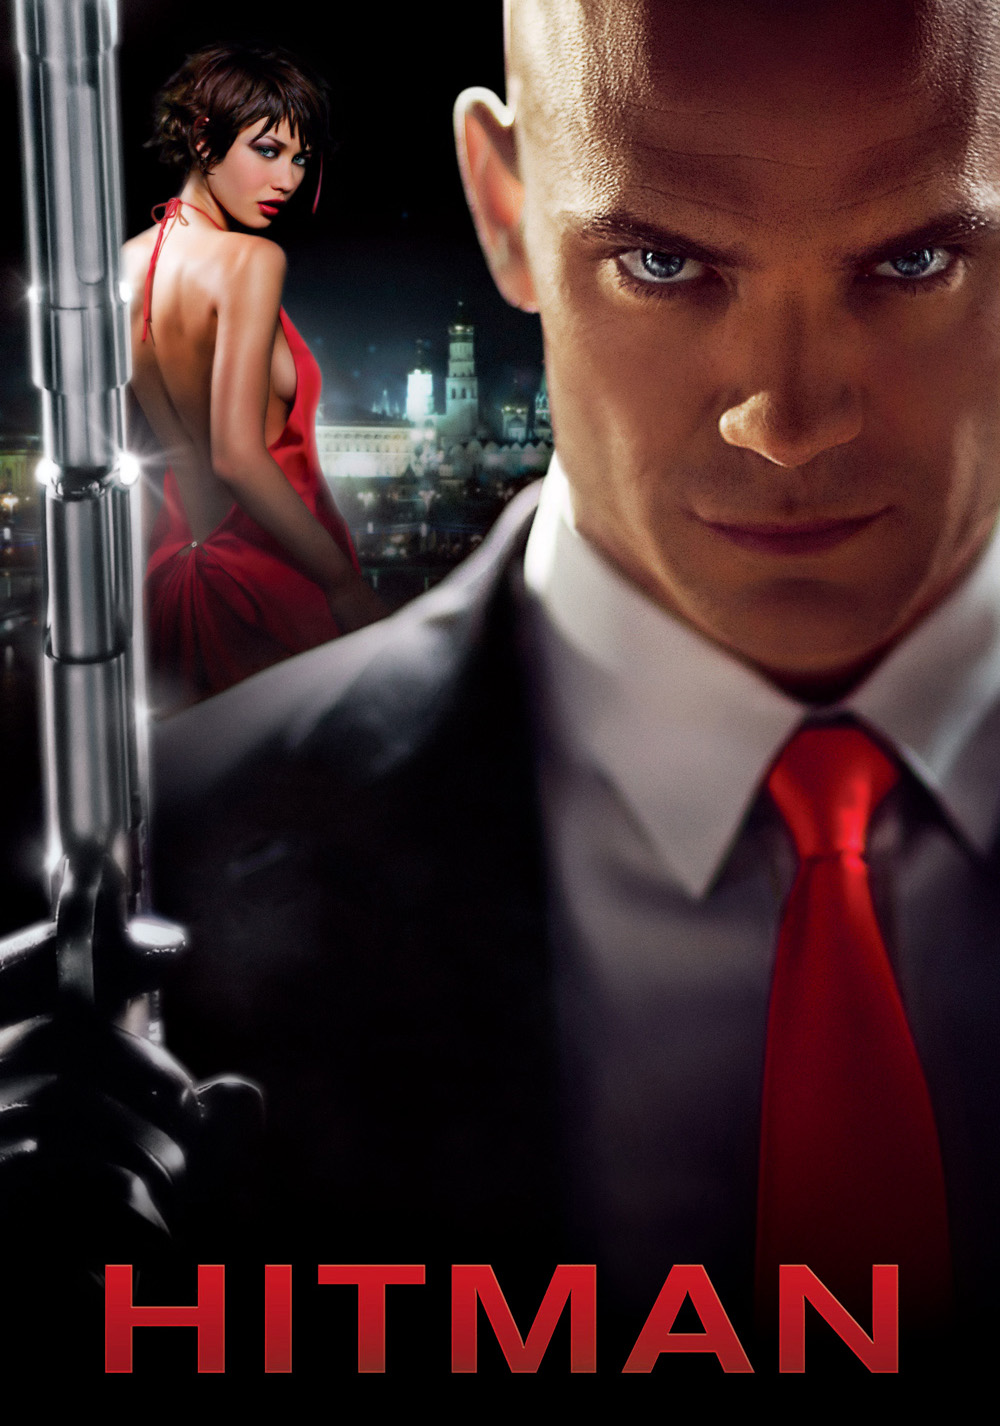 Hitman Movie Poster Hitman | Movie ...